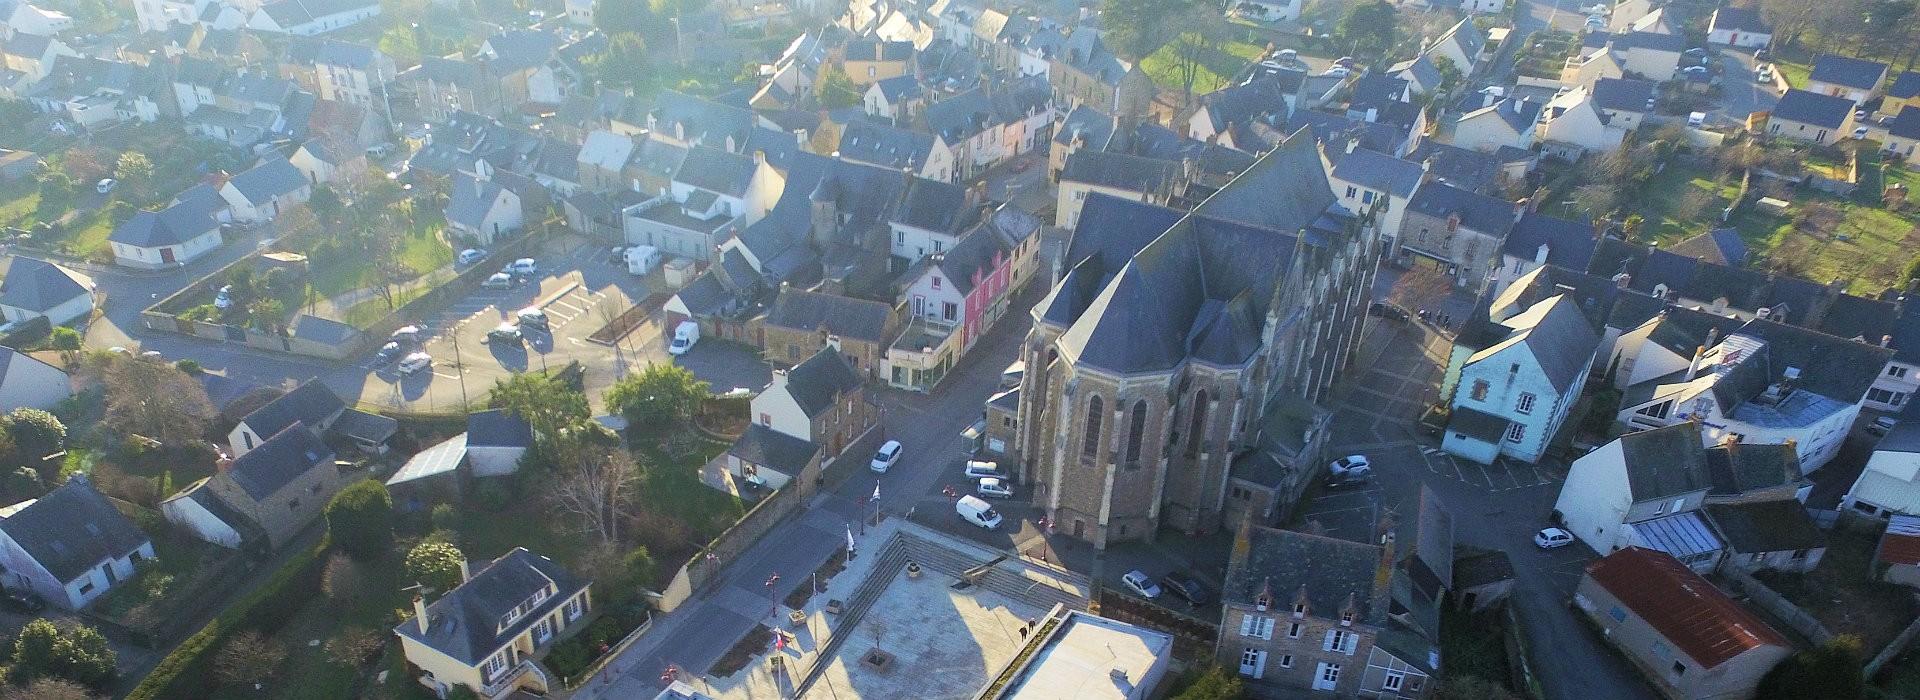 eglise-pageherbignac-visuel6-mairie-herbignac-tetiere-14980